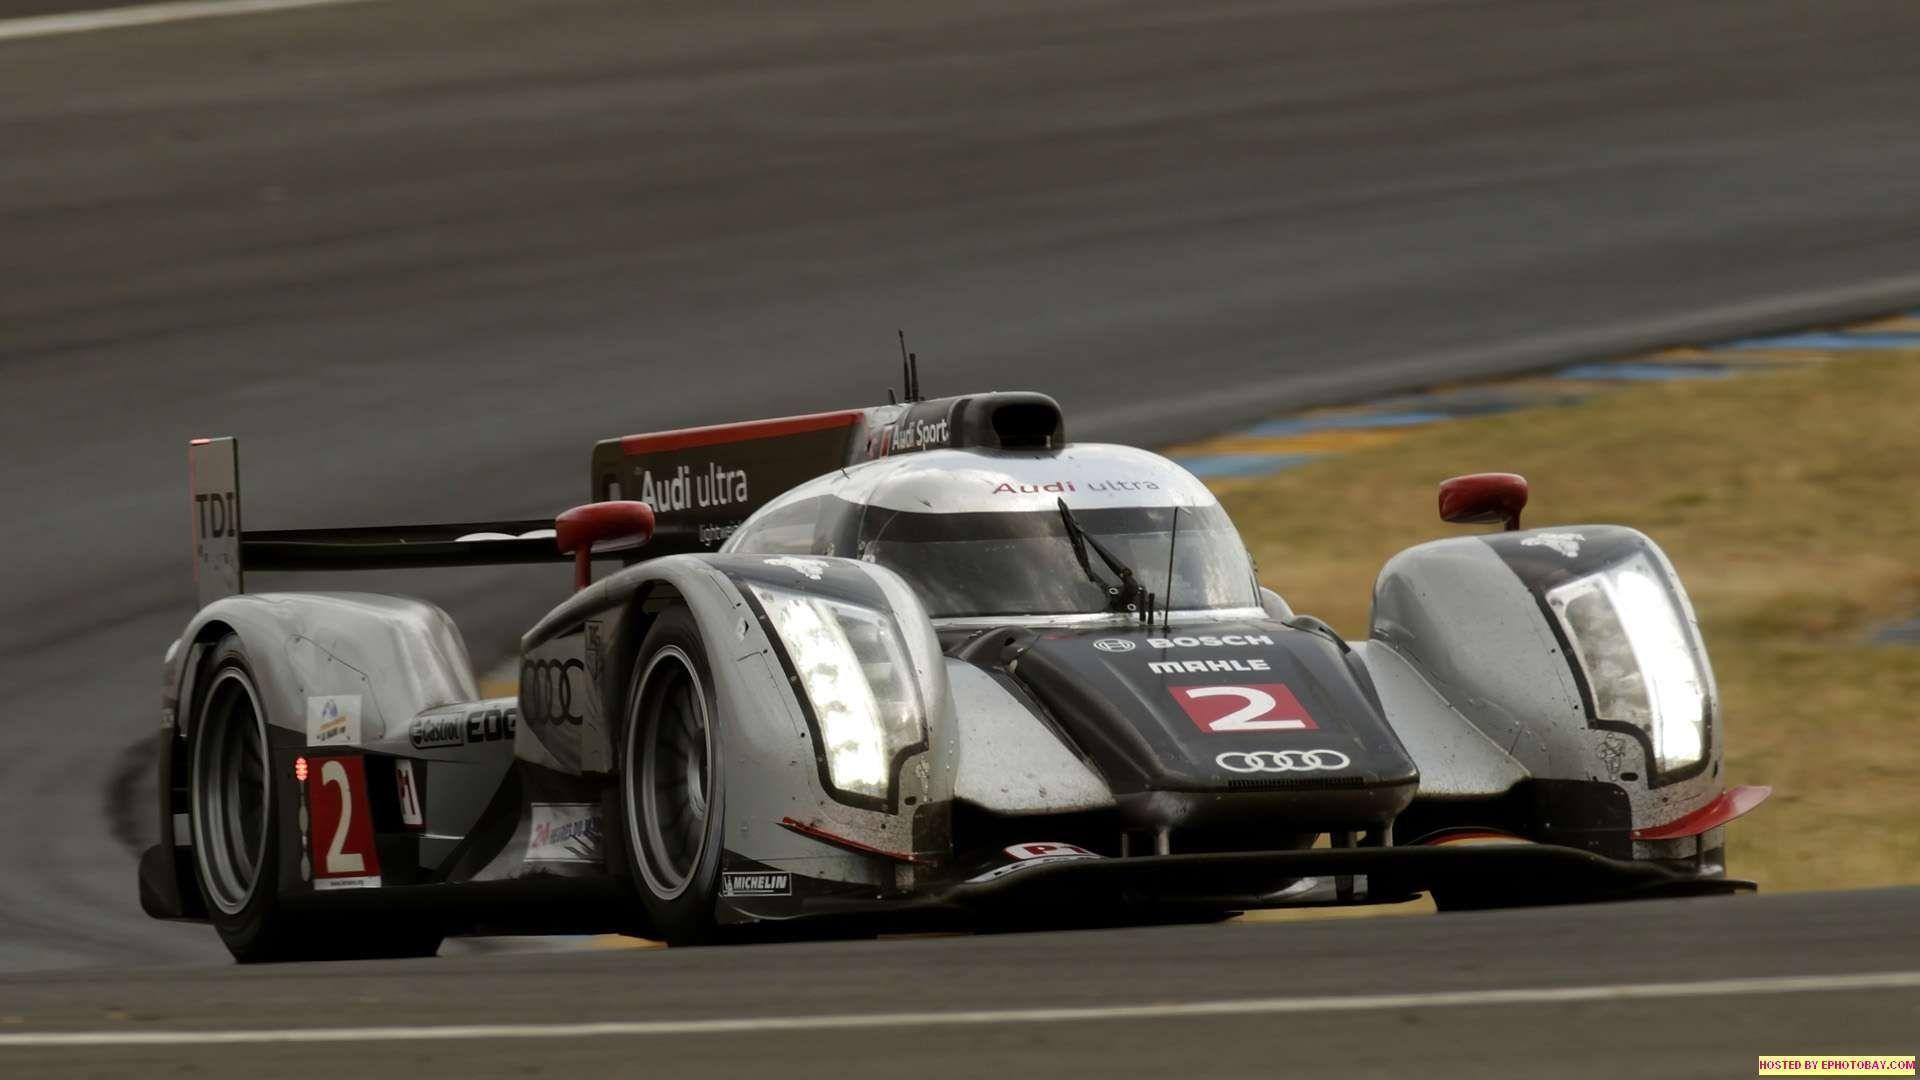 Audi Le Mans Wallpaper 452972 - WallDevil